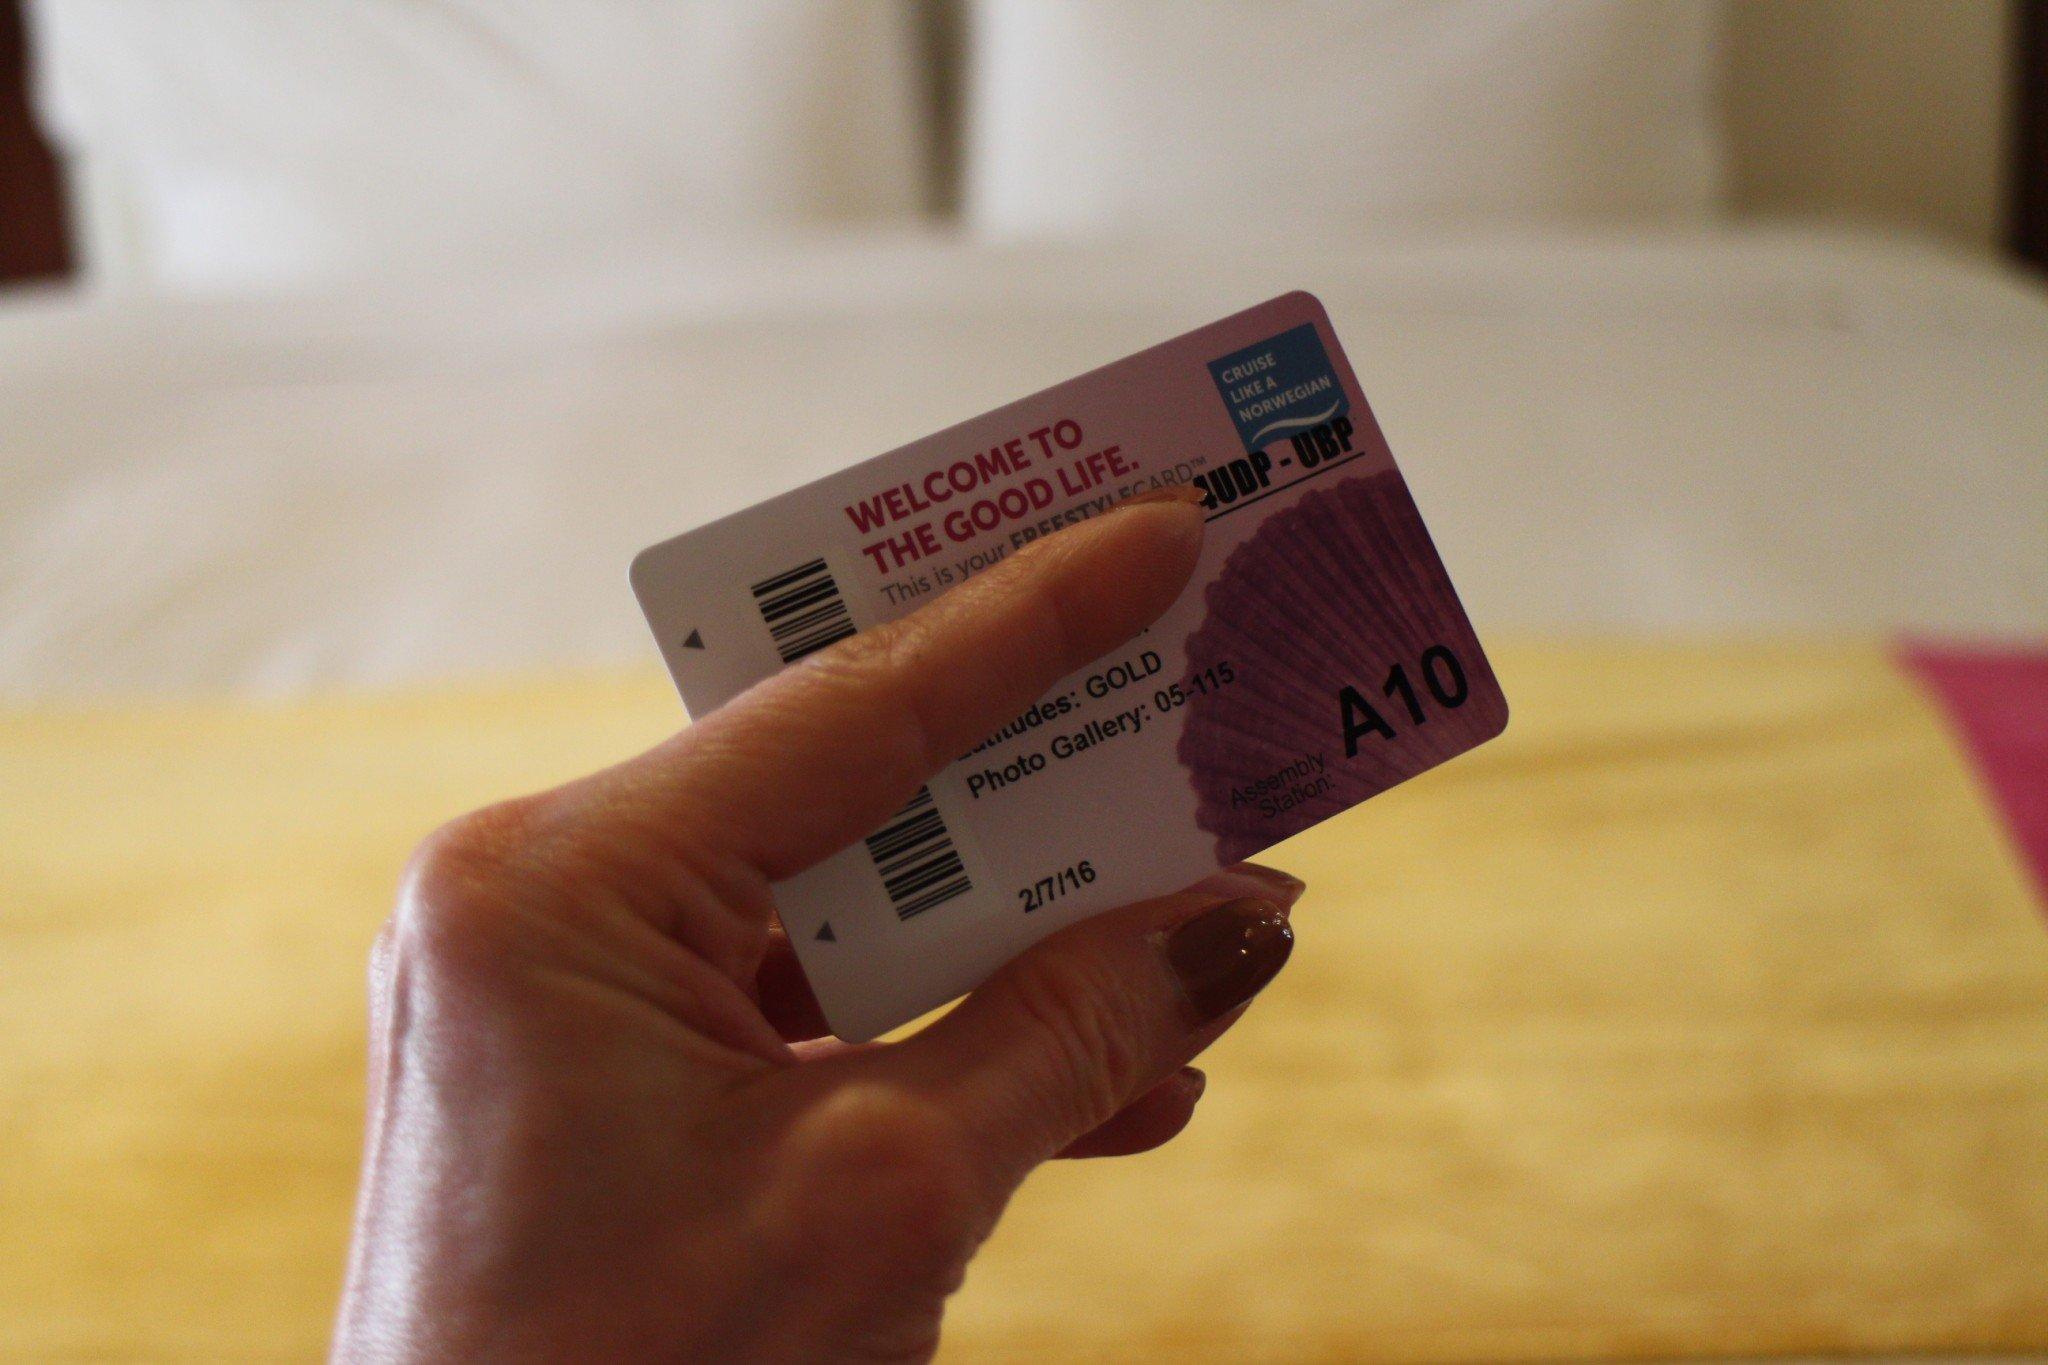 Norwegian Cruise Line Suite key card